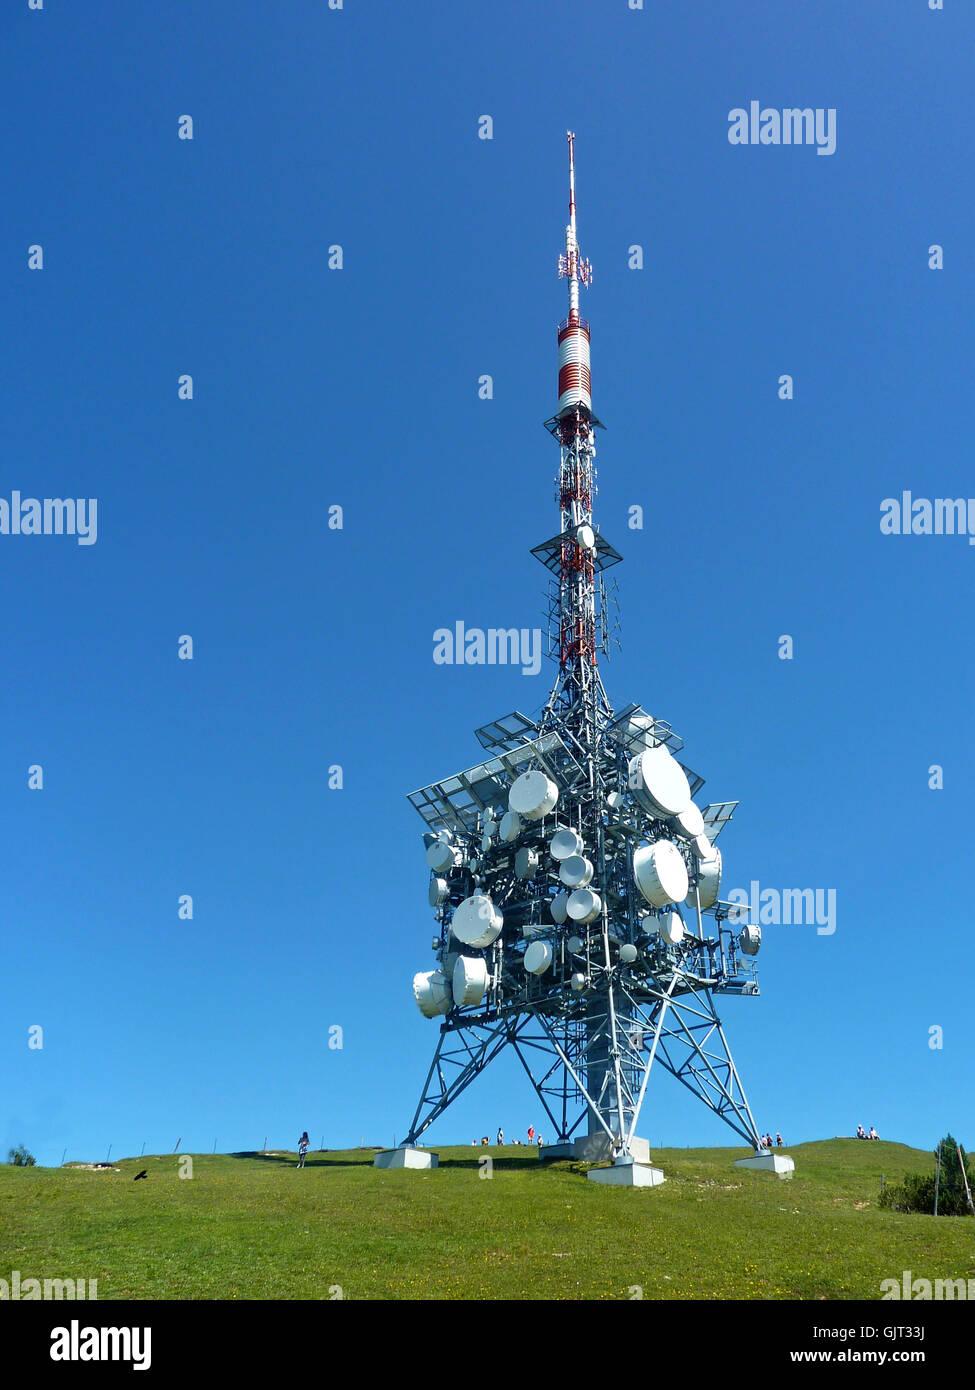 transmission tower 4 - Stock Image